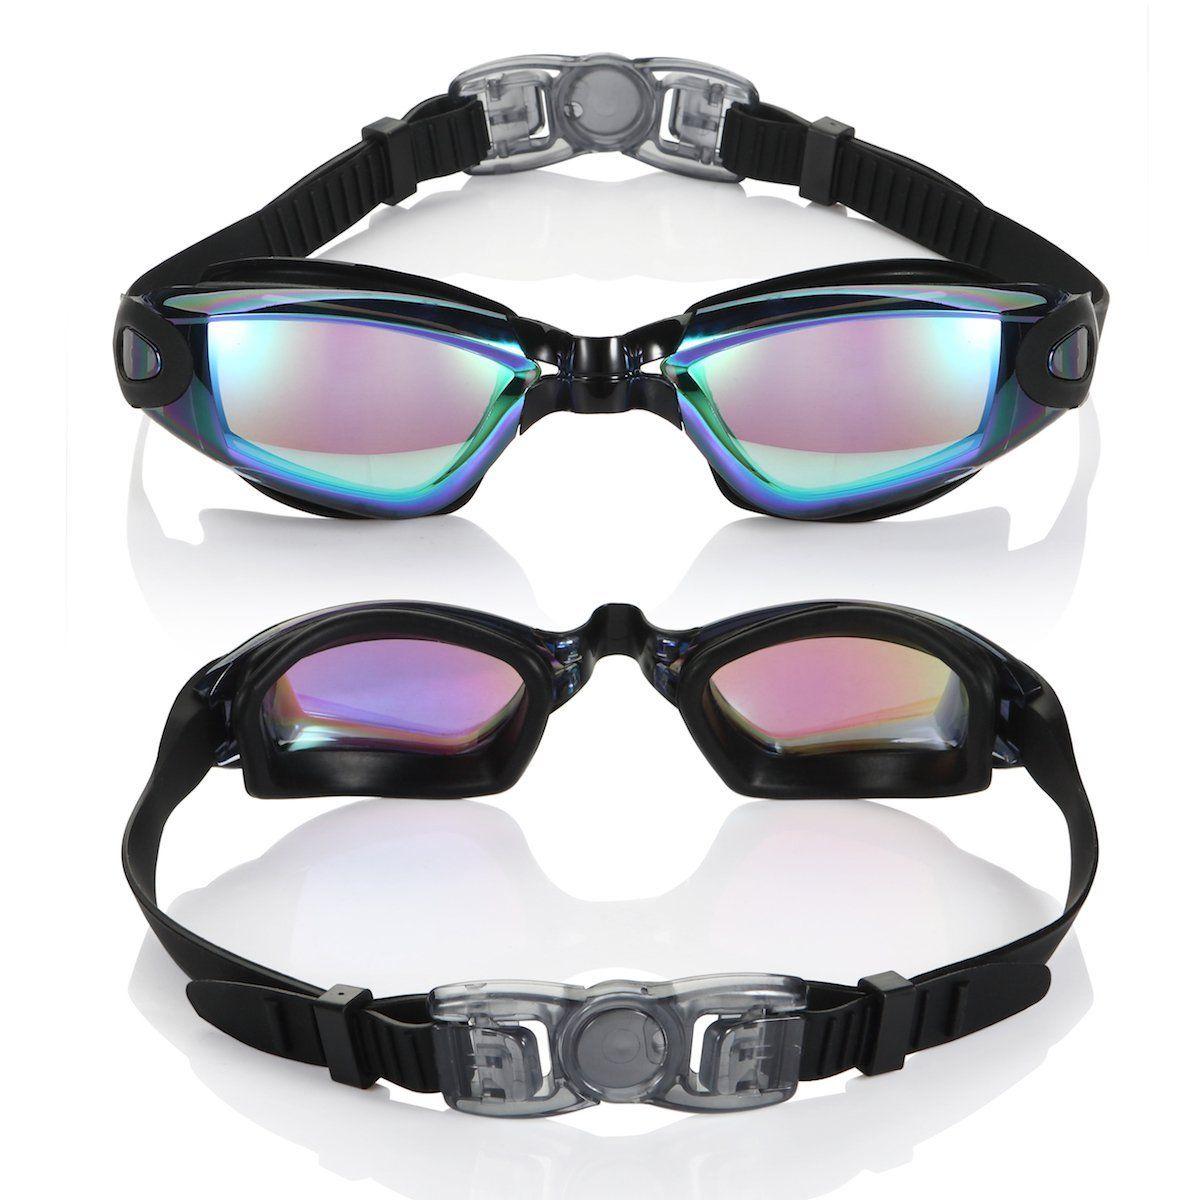 No Leaking Anti Fog UV Protection Triathlon Swimming Aegend Swim Goggles